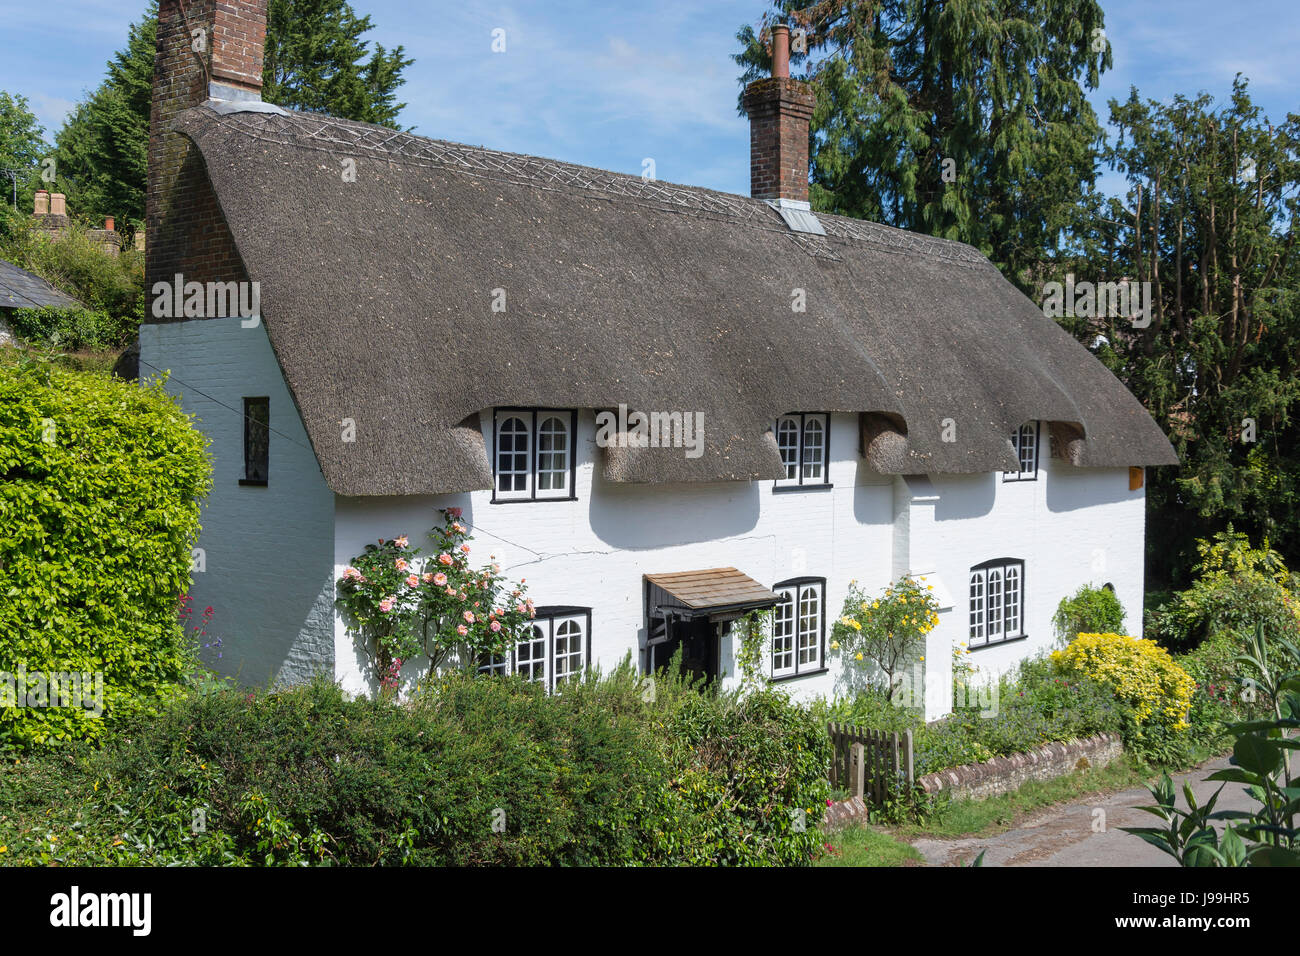 Thatched cottage, Church Lane, West Meon, Hampshire, England, United Kingdom - Stock Image